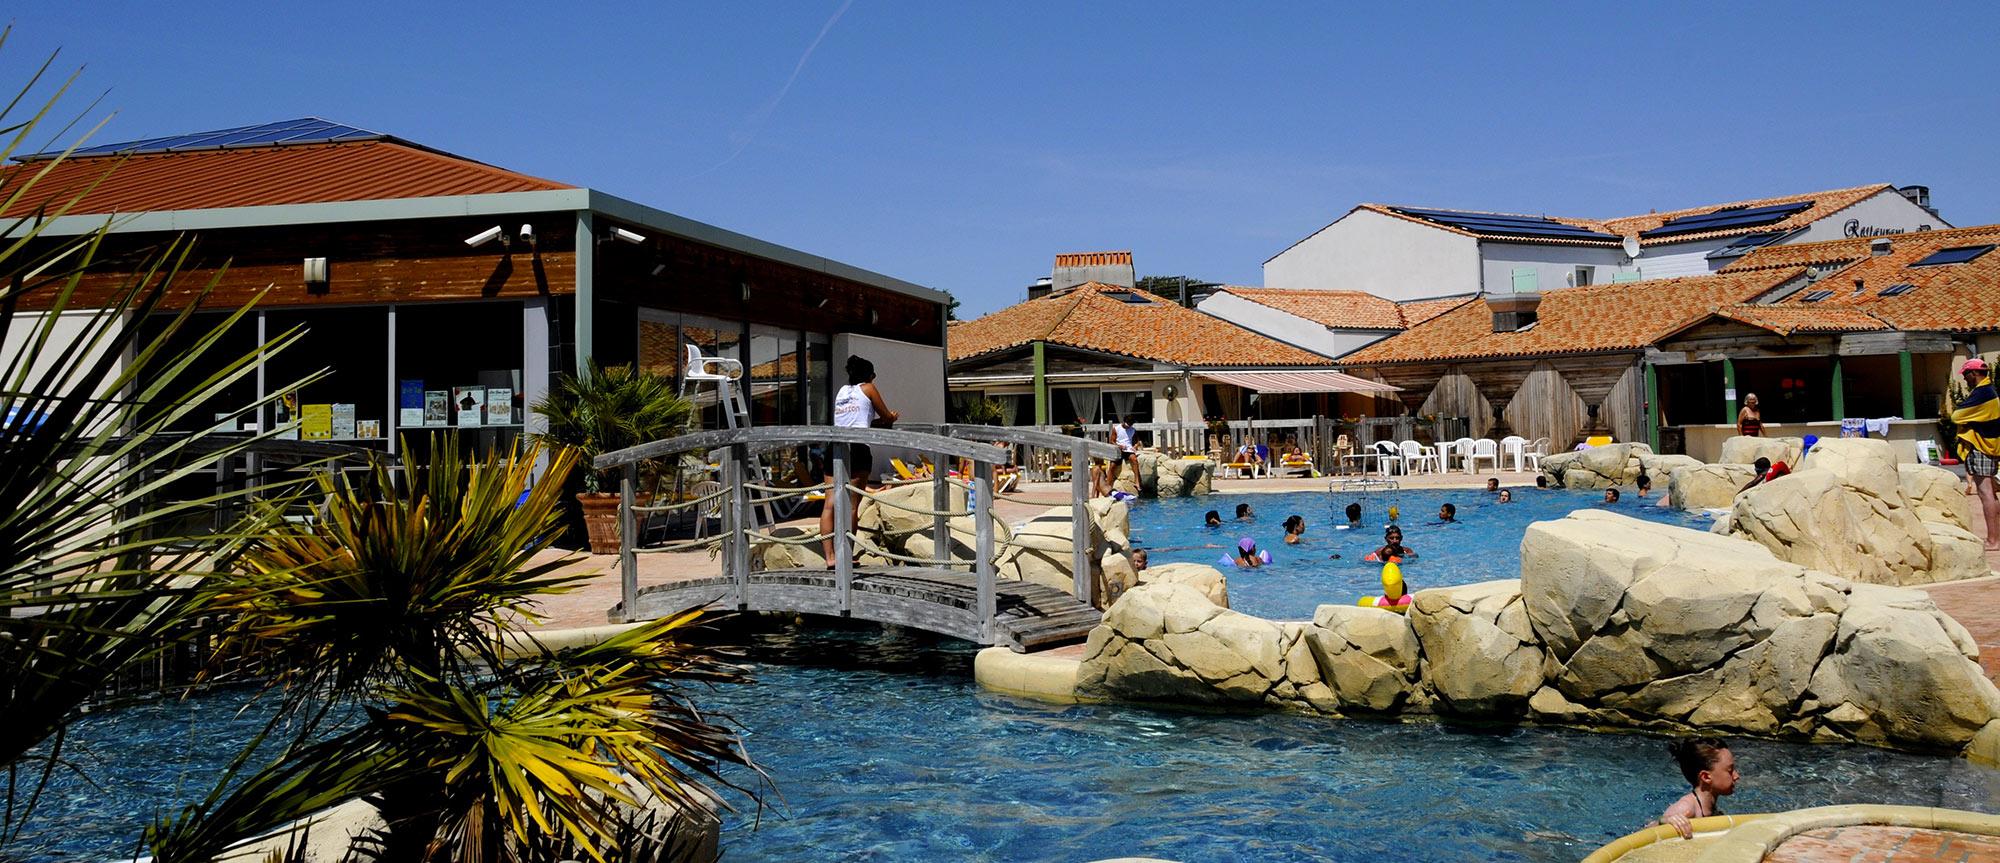 camping les Gros Joncs piscine